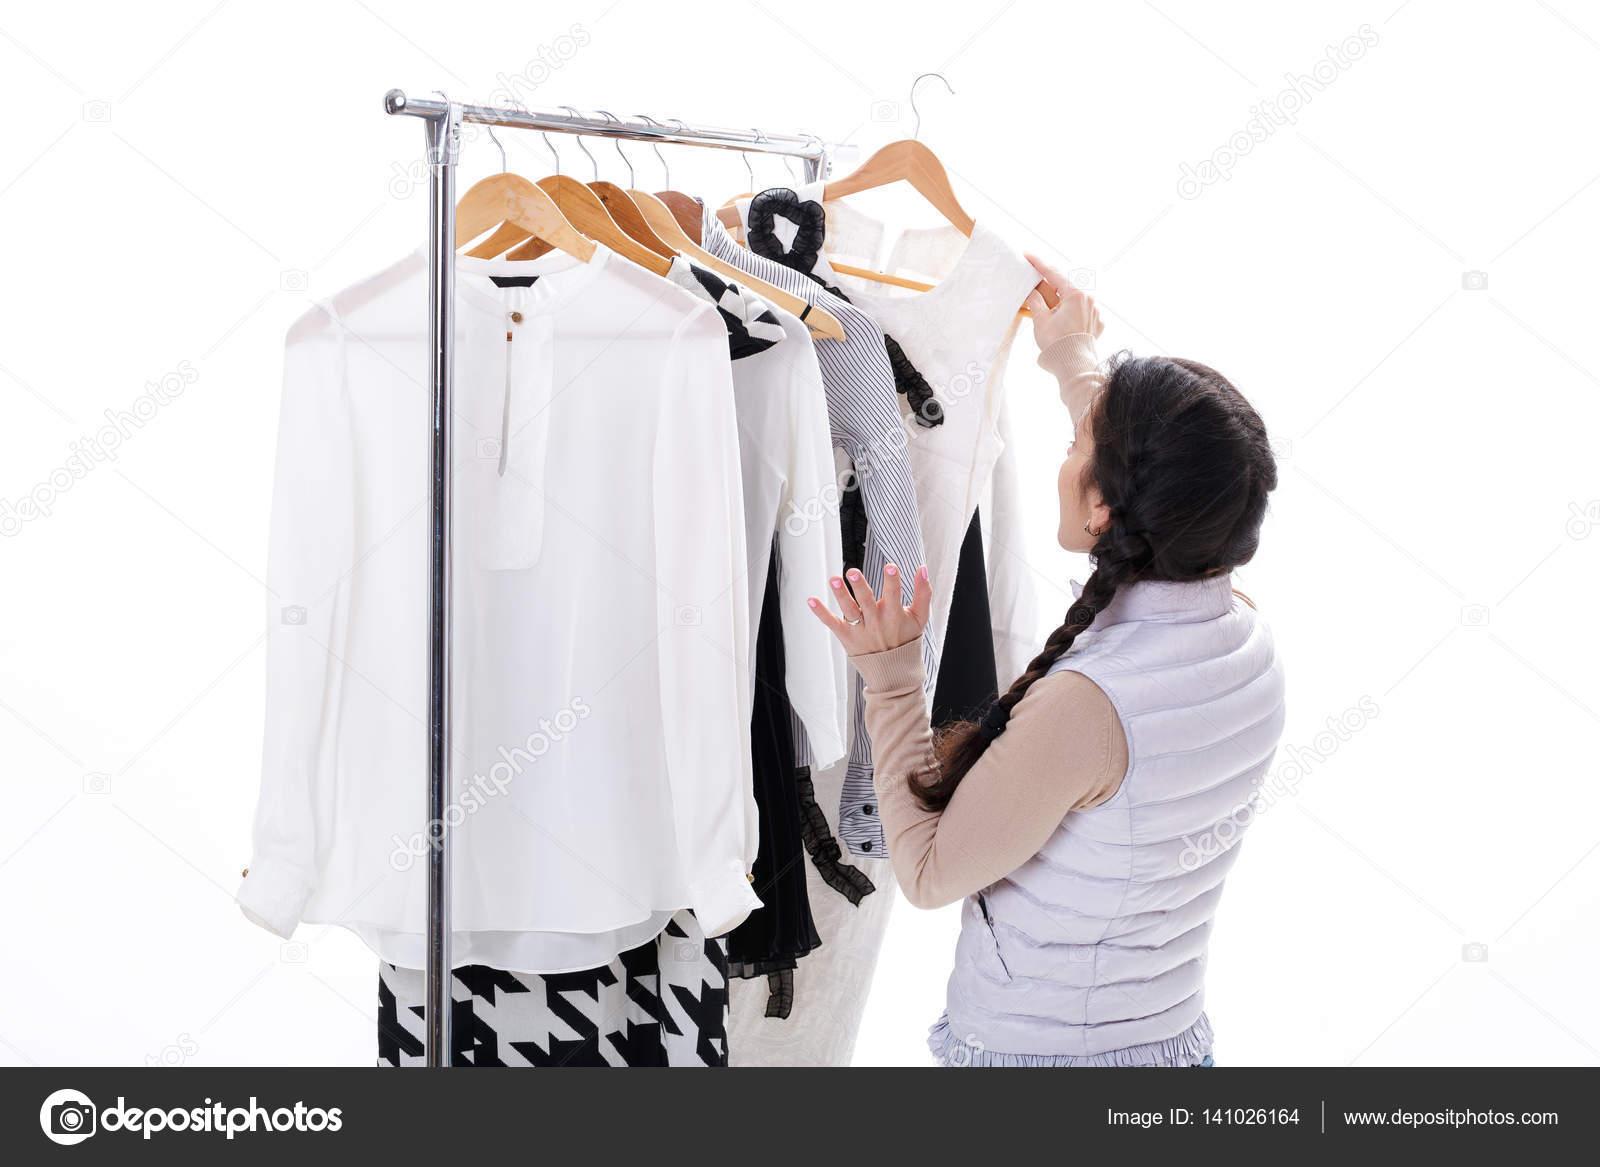 b7f65616feea ΕΜΠ — Φωτογραφία Αρχείου · Γυναίκα επιλέγει νέα μόδα ρούχα στις ξύλινες  κρεμάστρες στο ράφι σε άσπρο φόντο. Ψώνια έννοια — Εικόνα από erstudio